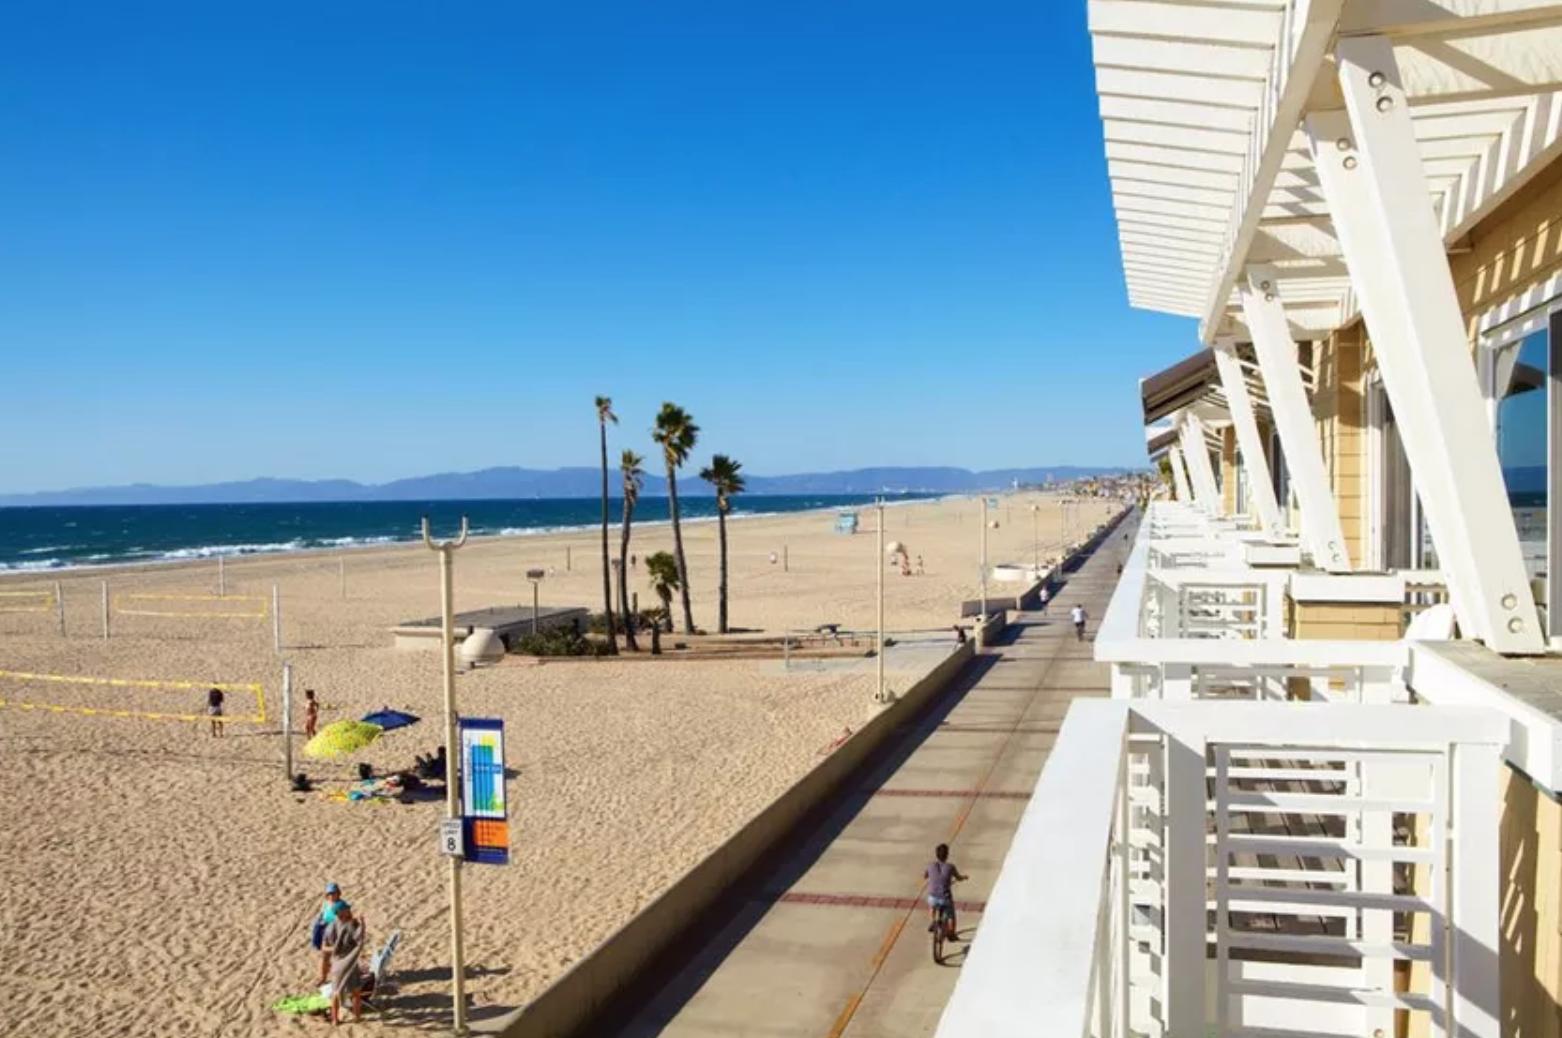 Beach House - 1300 The Strand, Hermosa Beach, CA 90254